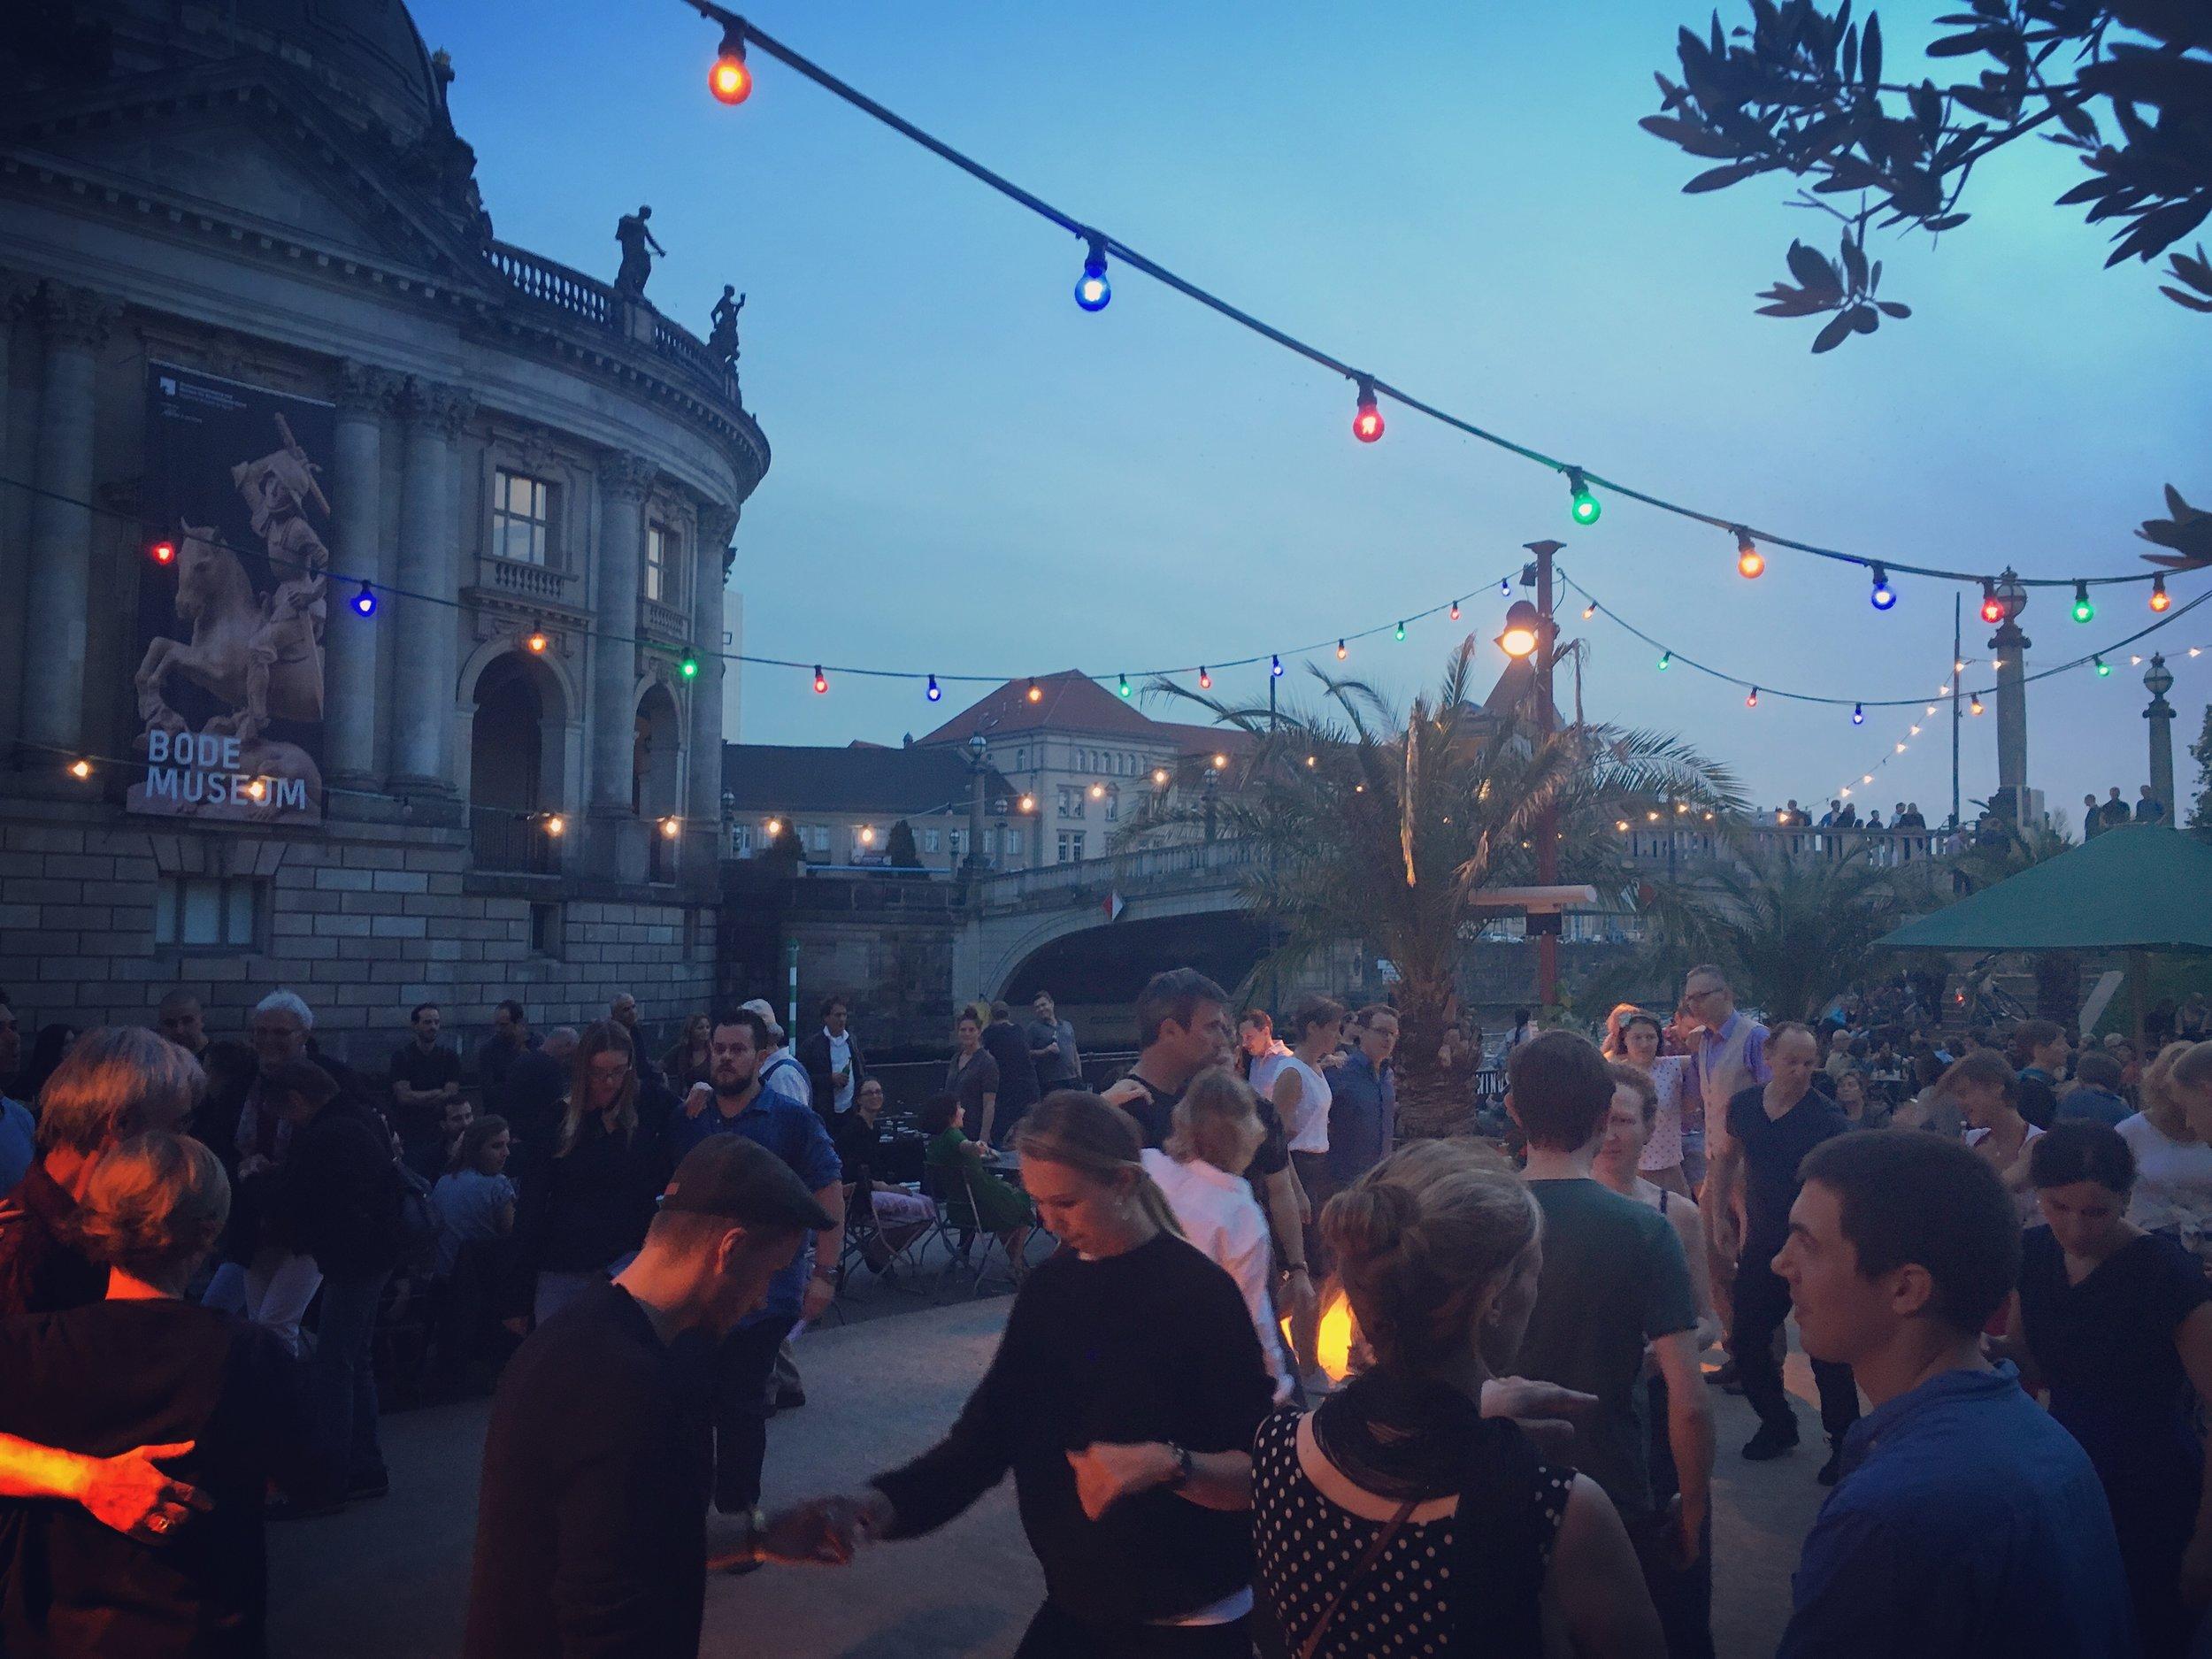 Strandbar-Mitte-Berlin-dancing